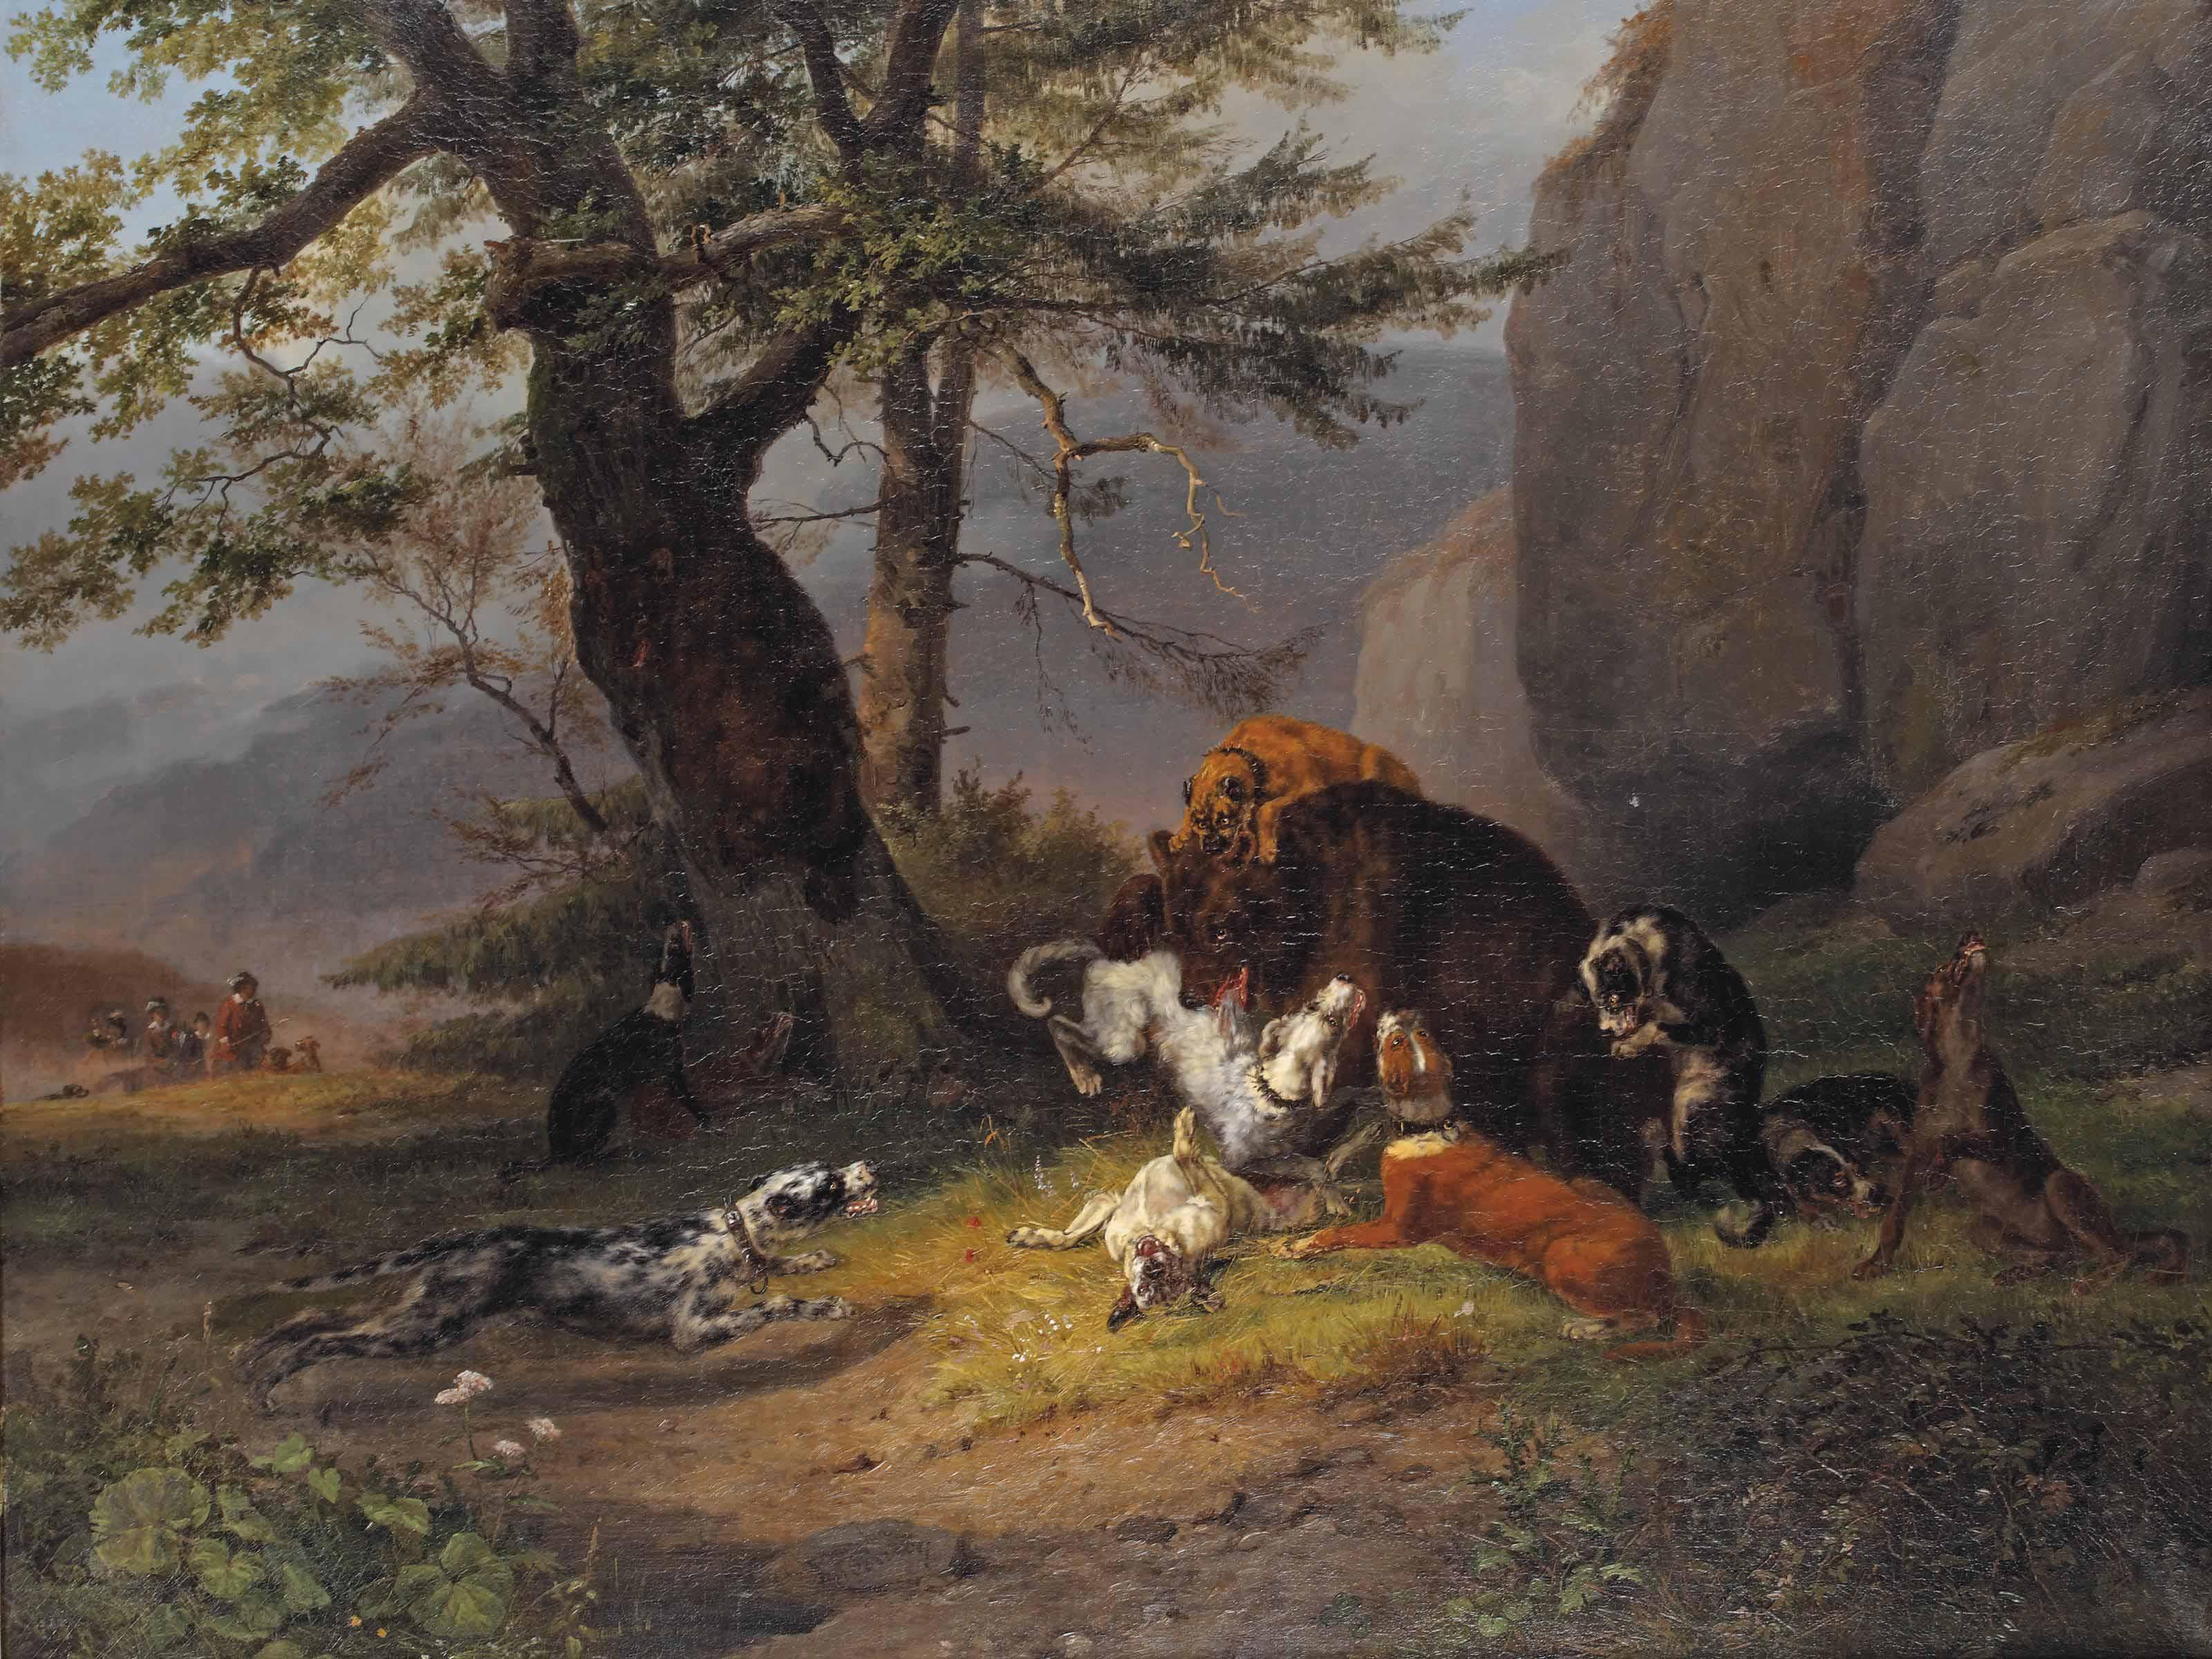 Guillaume Anne van der Brugghe